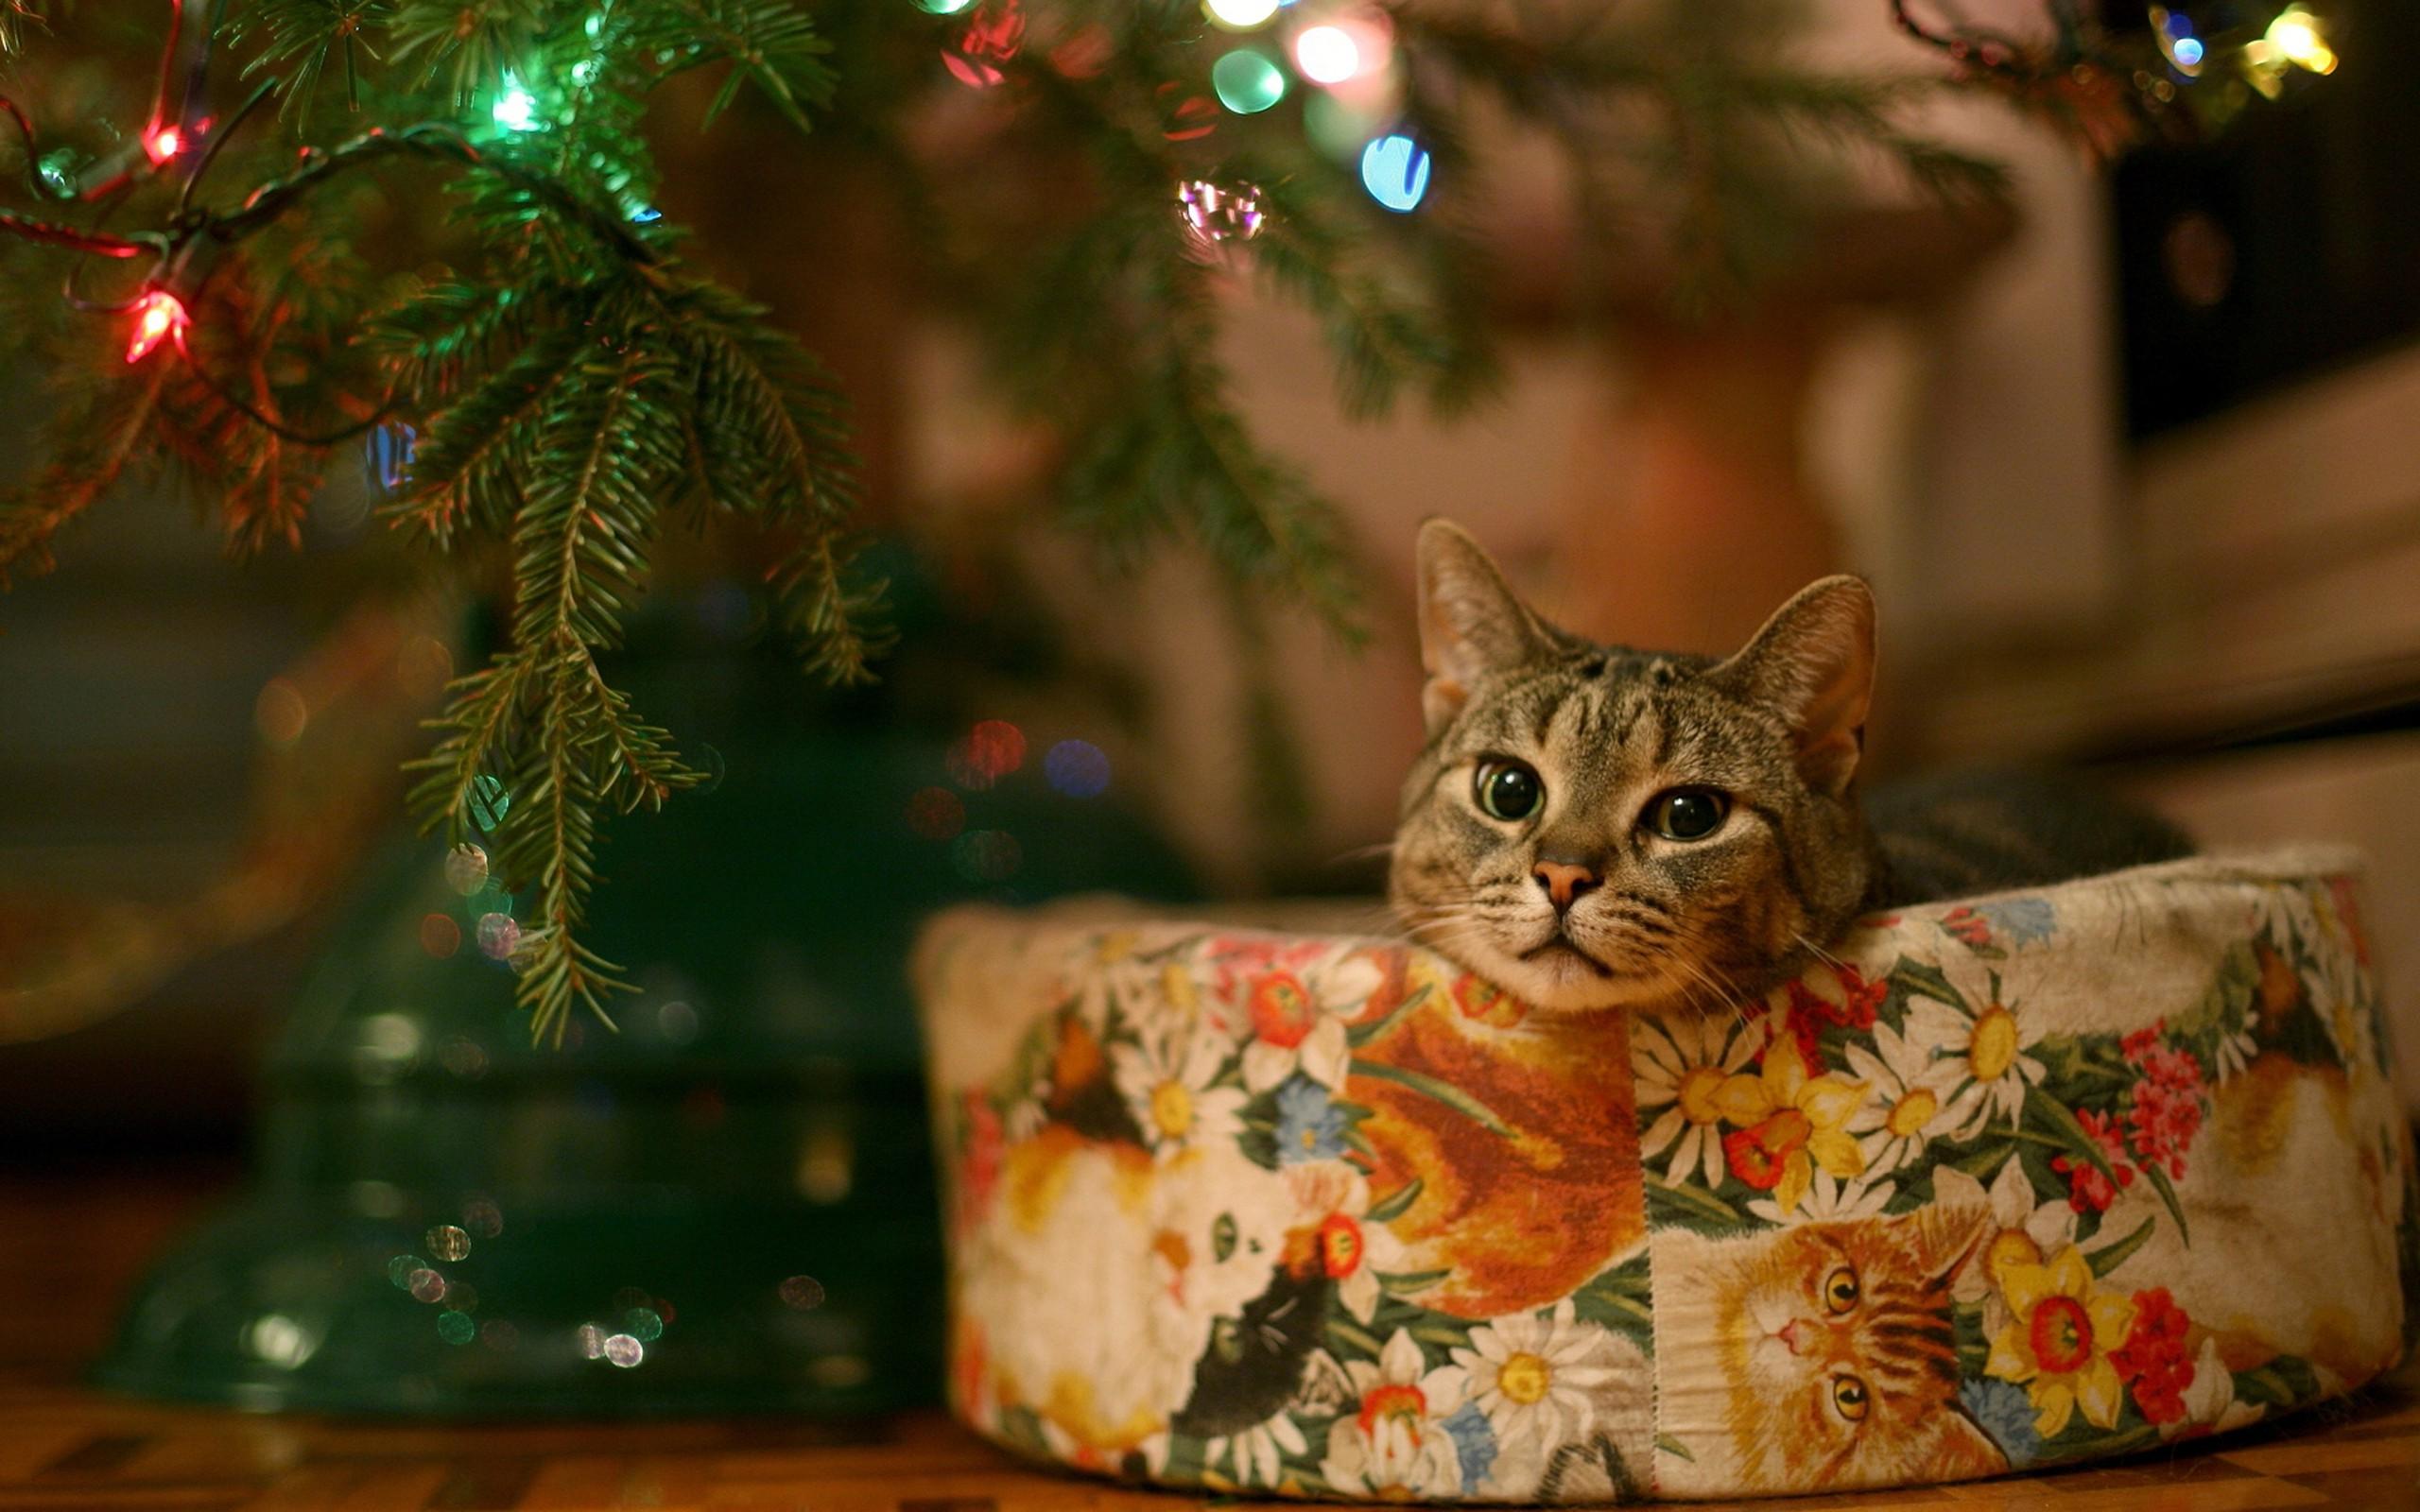 Wallpaper : lights, leaves, animals, branch, Christmas ...